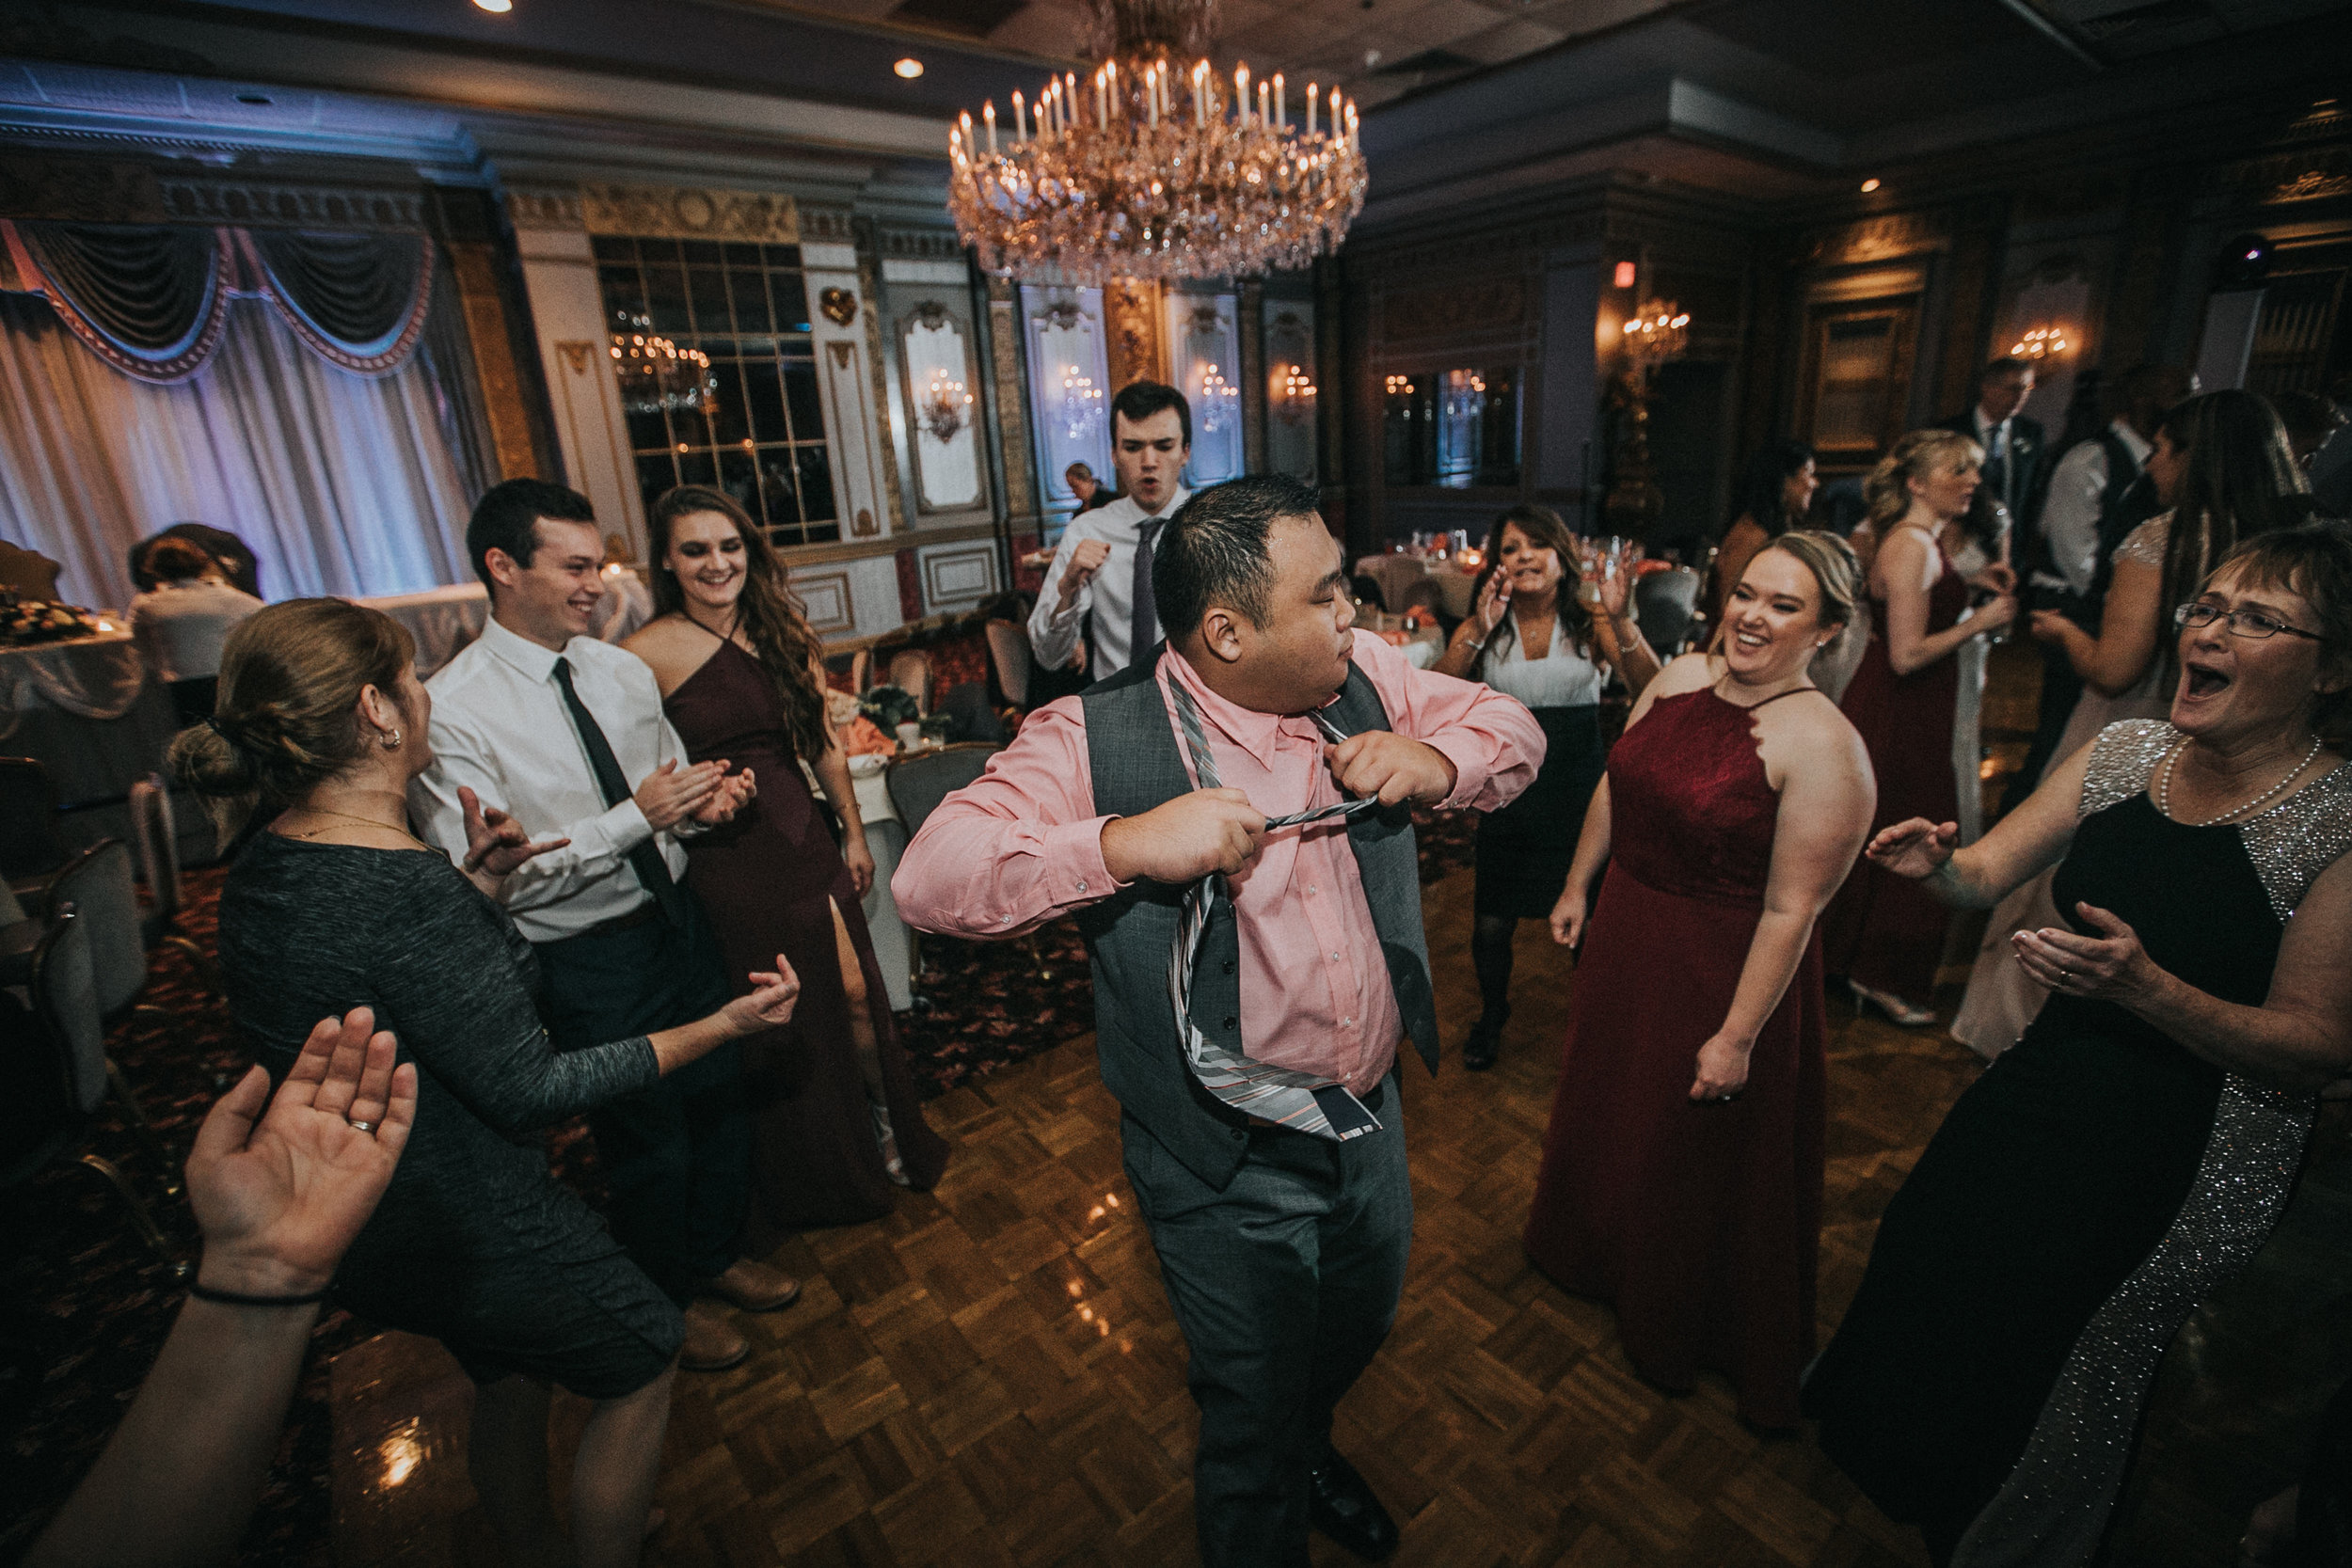 New-Jersey-Wedding-Photography-Fishers-Tudor-House-JennaLynnPhotography-Reception-Kathleen&Eddie-272.jpg